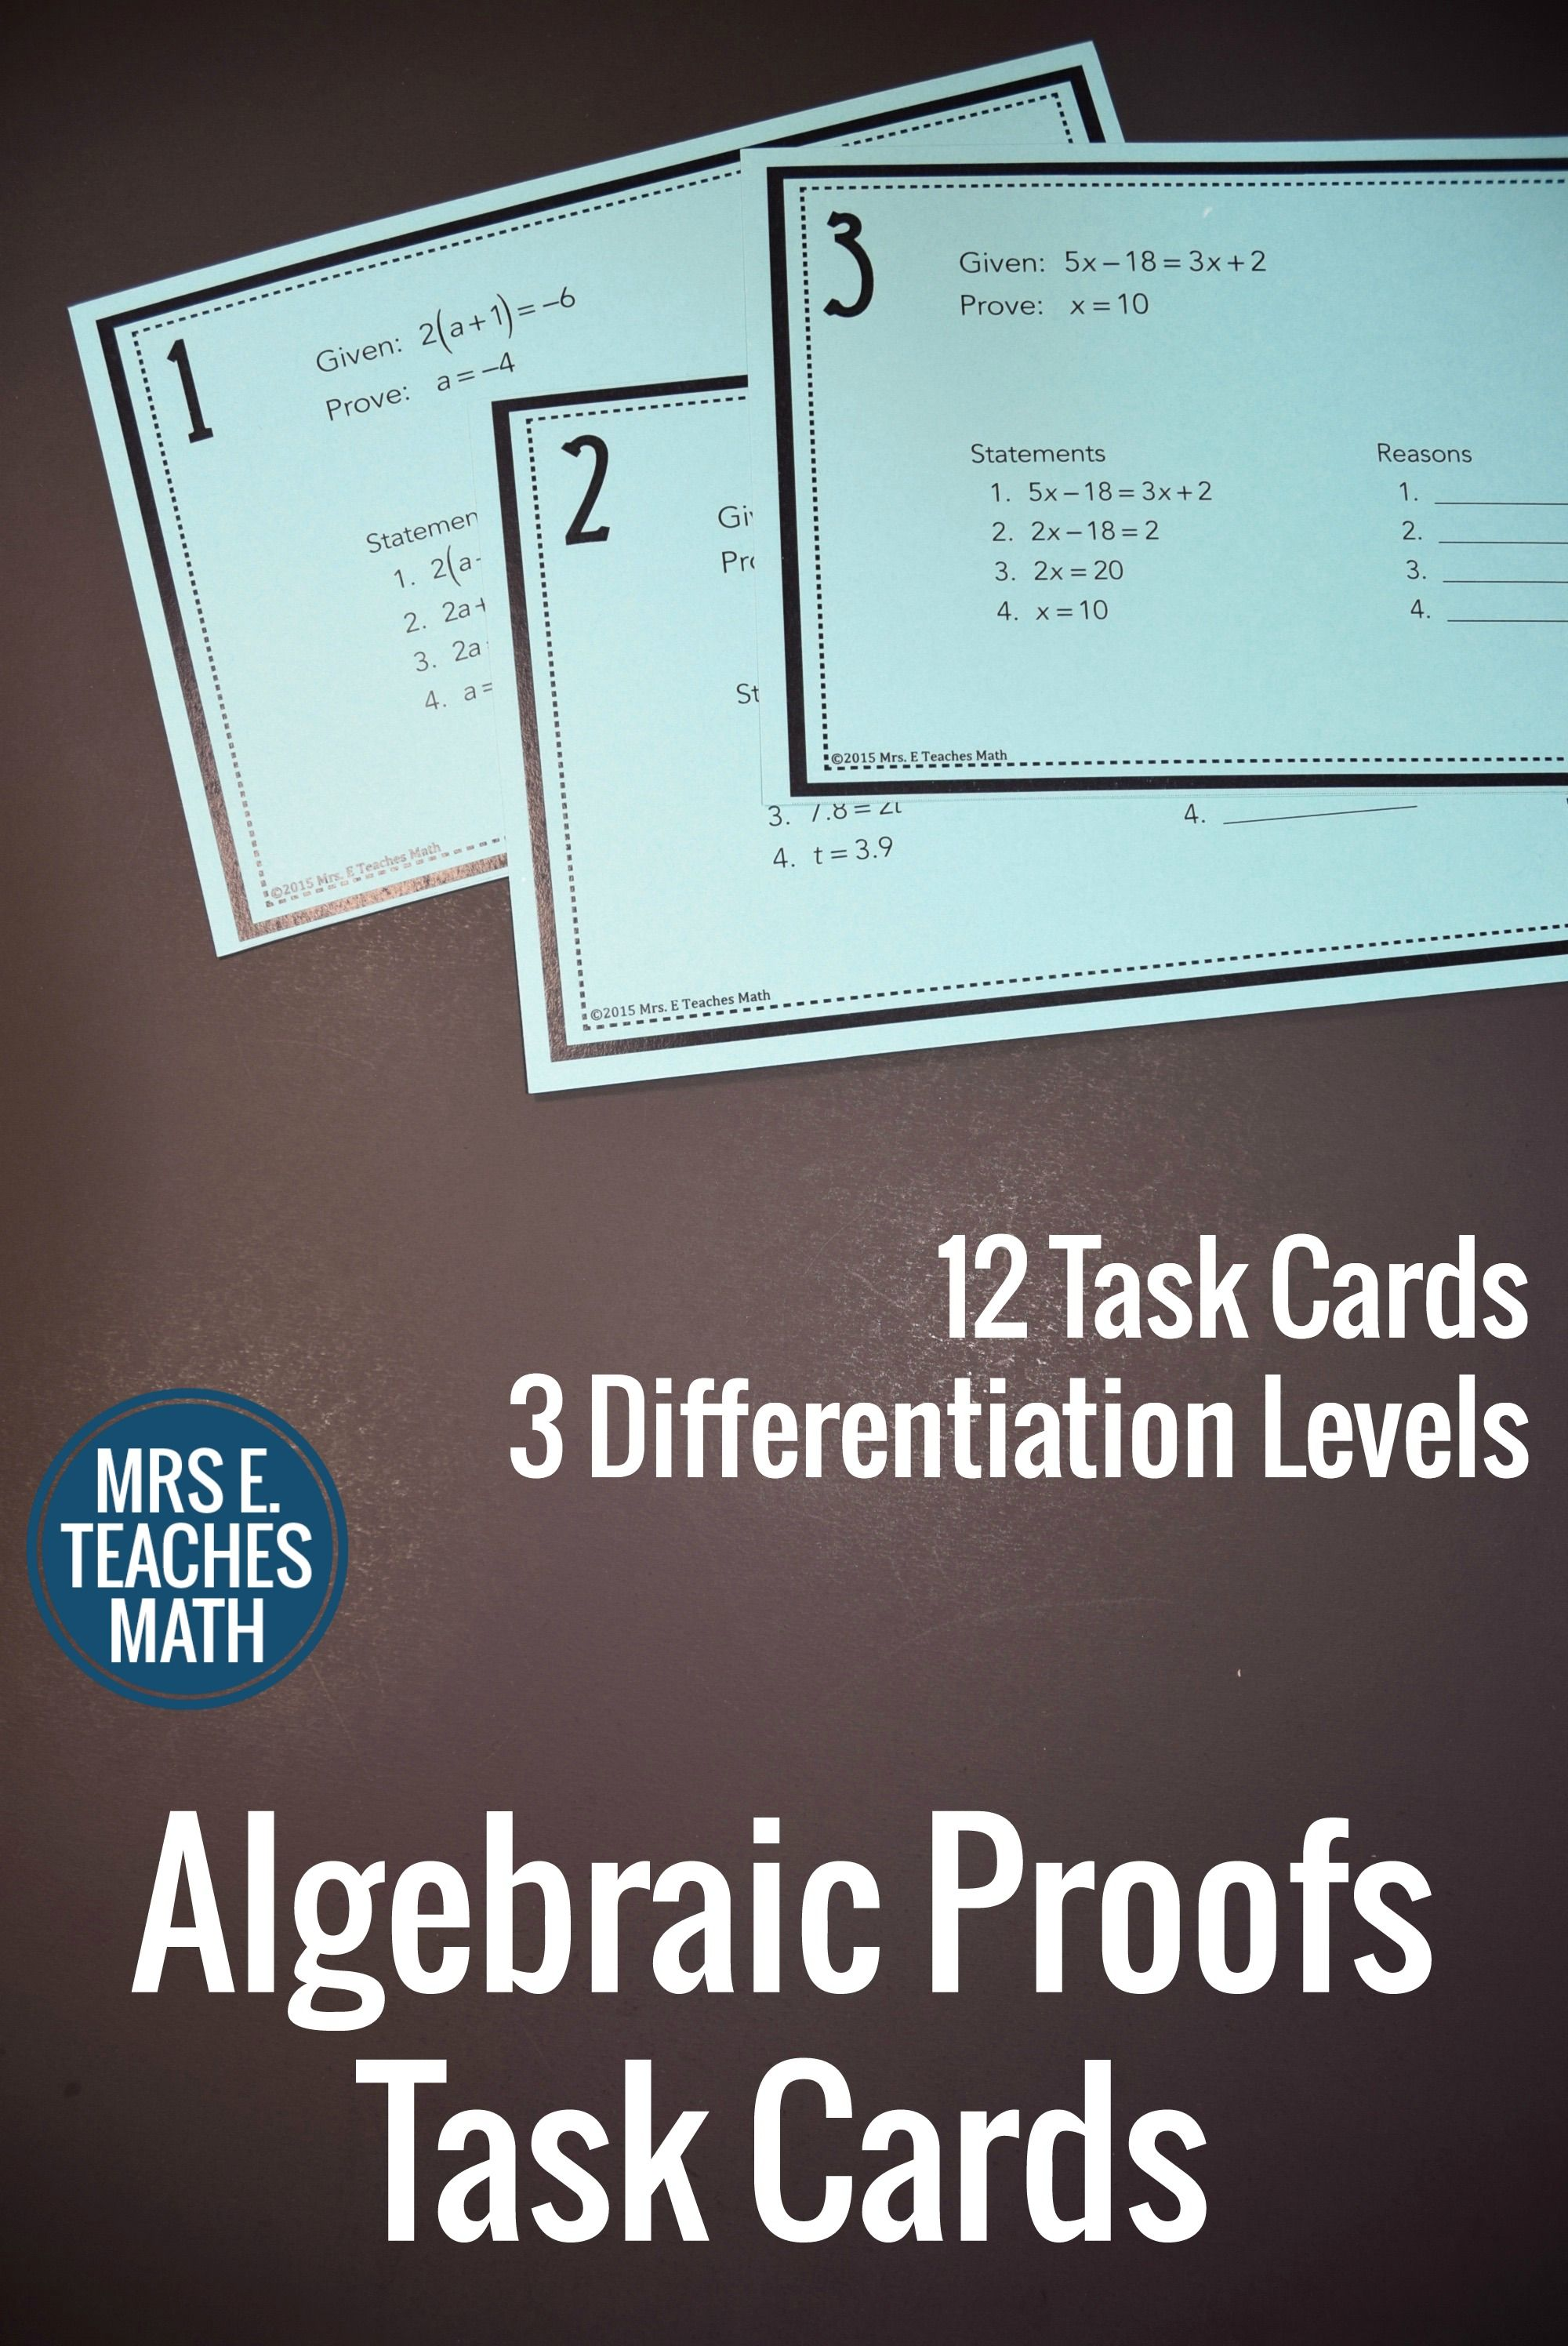 Worksheet Algebraic Proof Answers